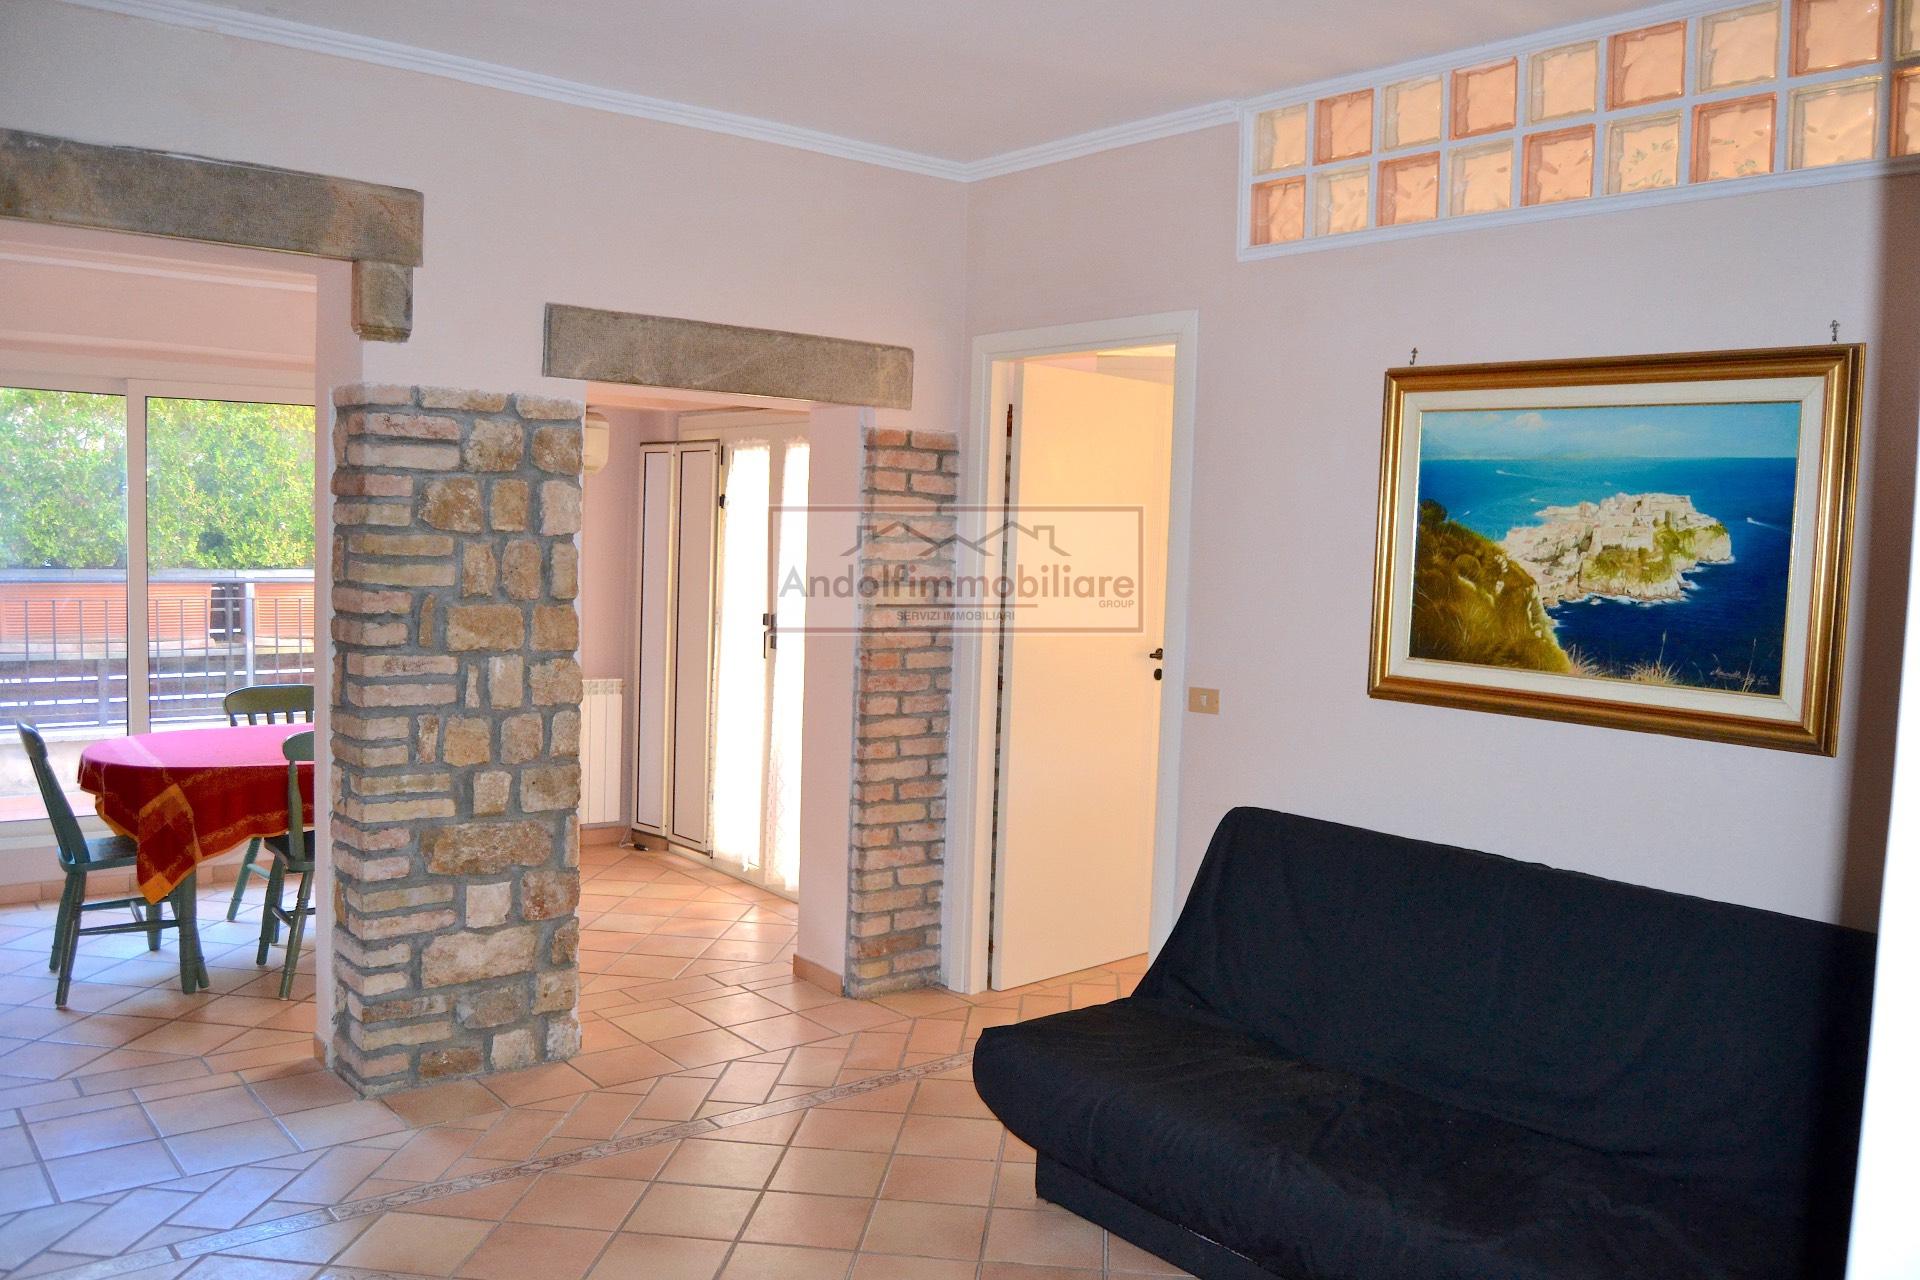 Foto - Appartamento In Vendita Gaeta (lt)